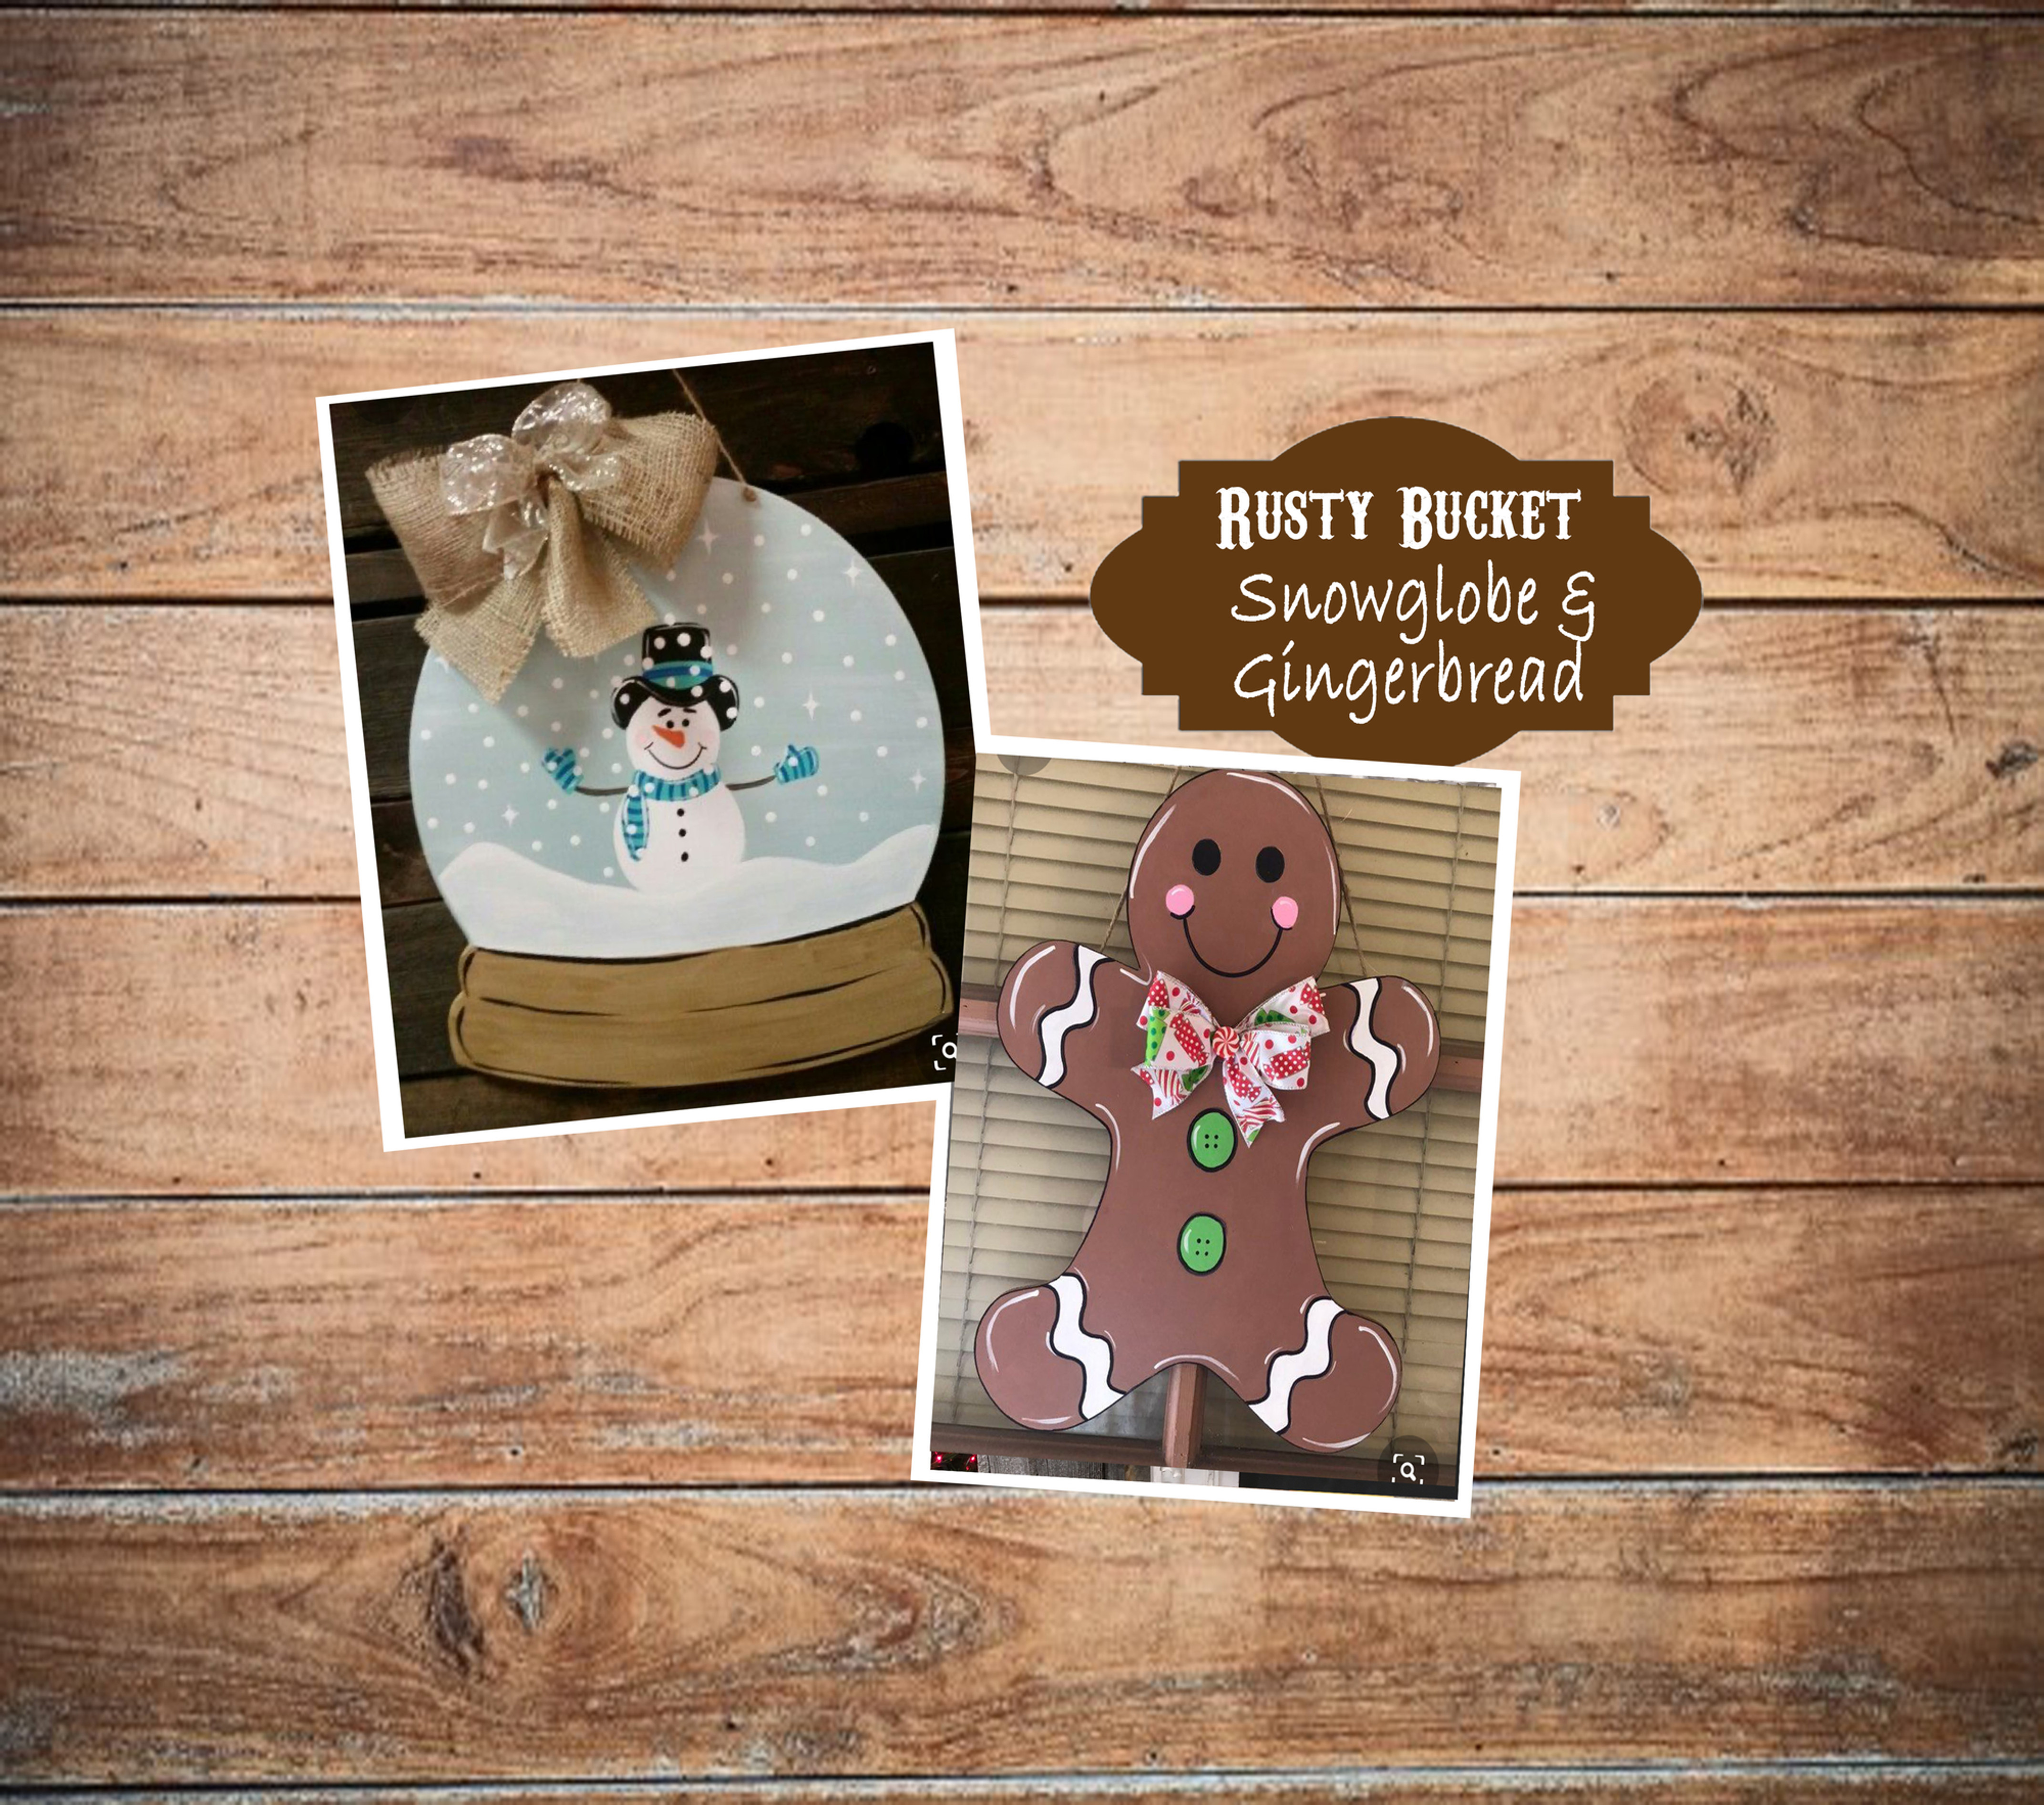 Snowglobe & Gingerbread Workshop | Dec 7